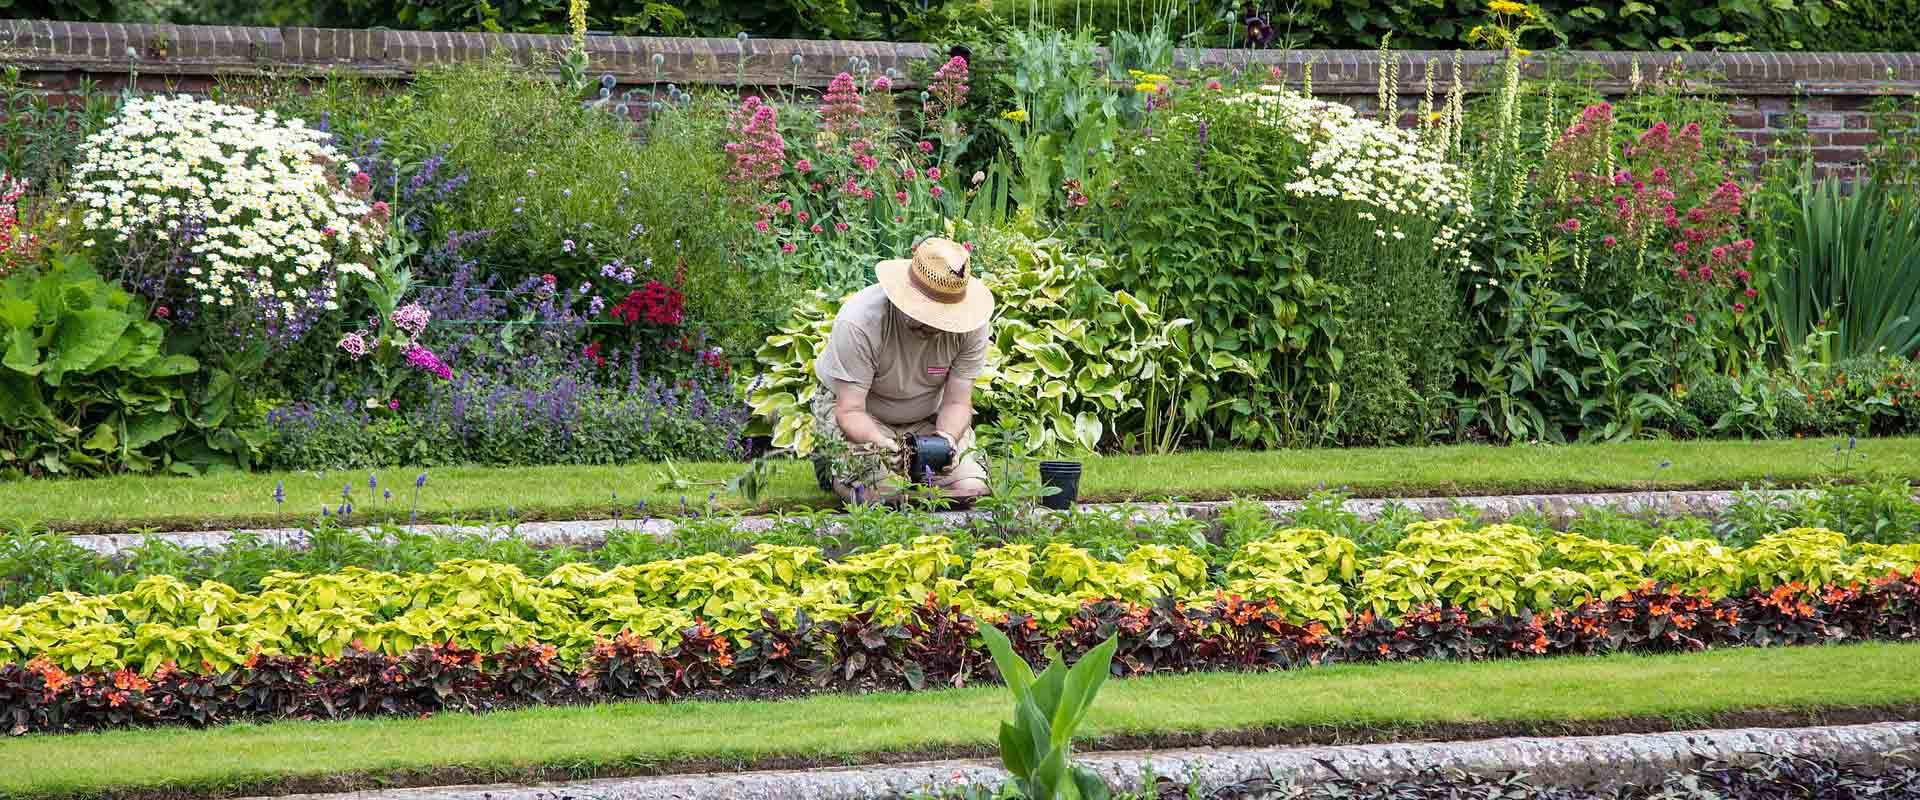 Permalink zu:App des Monats: Garten Ratgeber